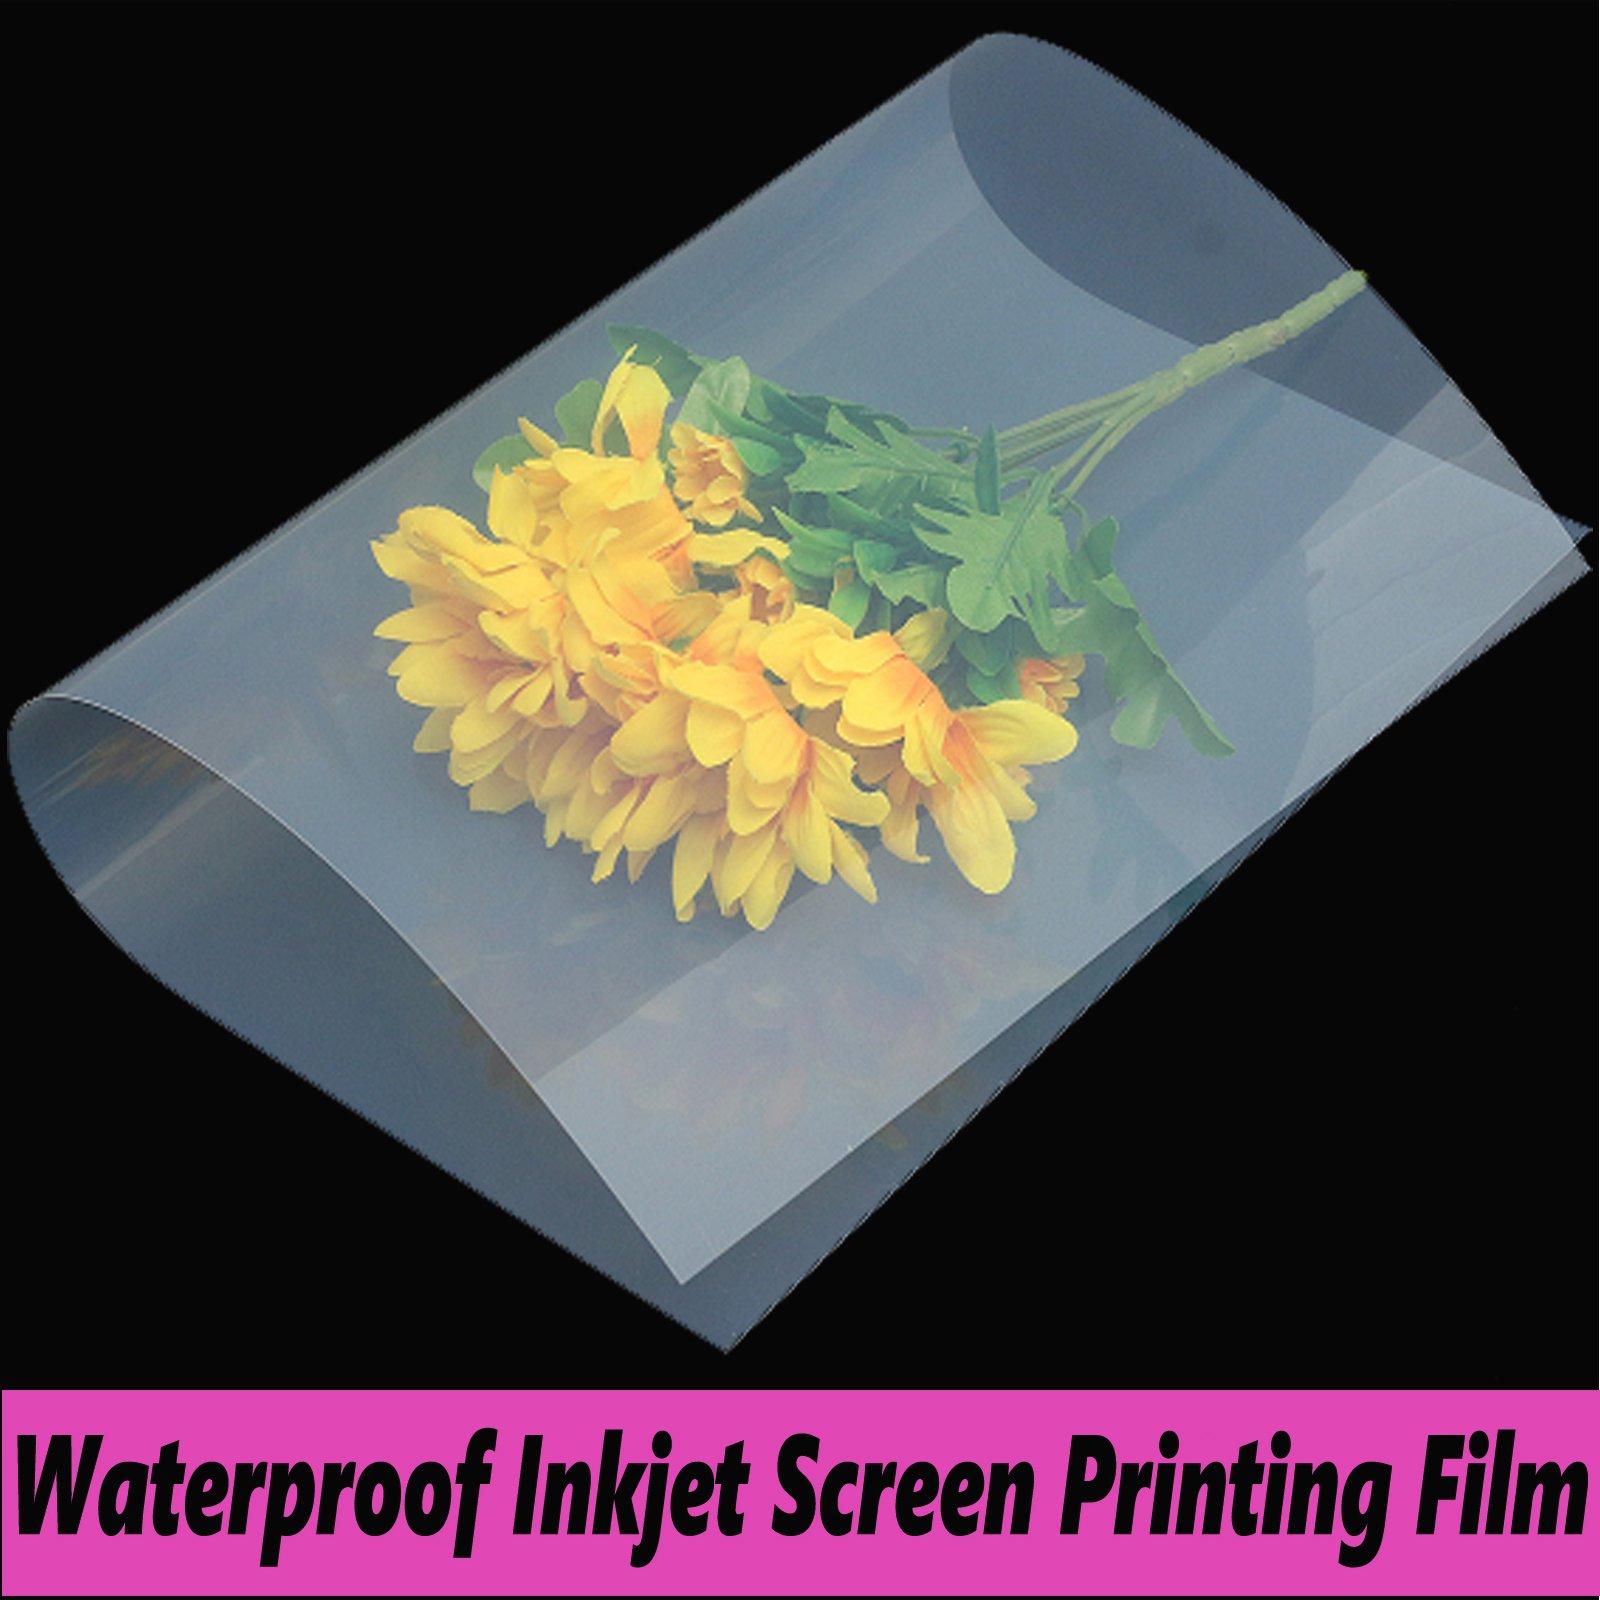 800 Sheets,Waterproof Inkjet Silk Screen Printing Transparency Film (800 sheets 13''x18'')